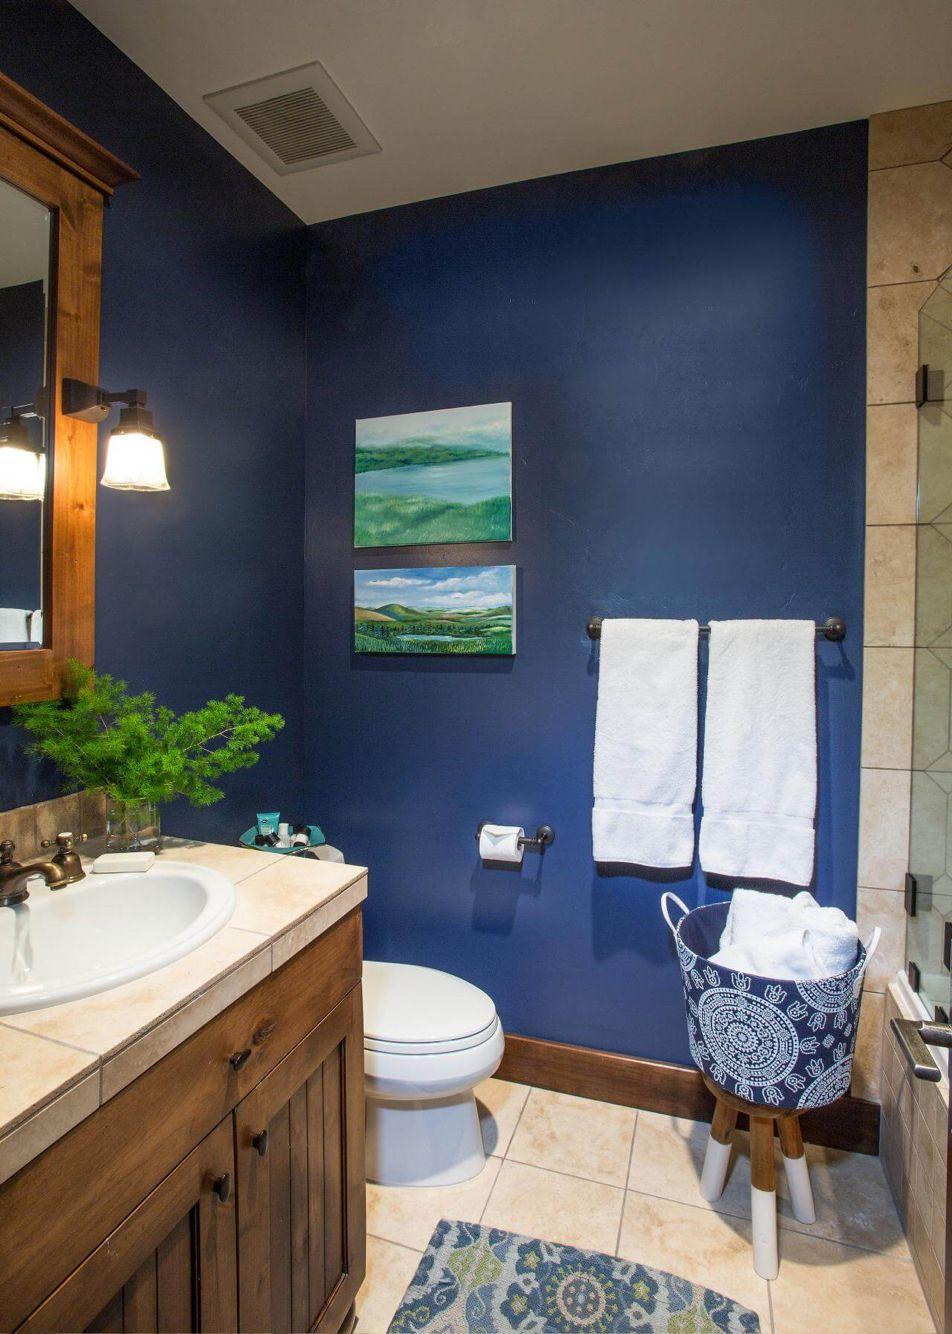 Navy Blue Walls Oak Cabinet Oiled Bronzed Fixtures Tile Floors